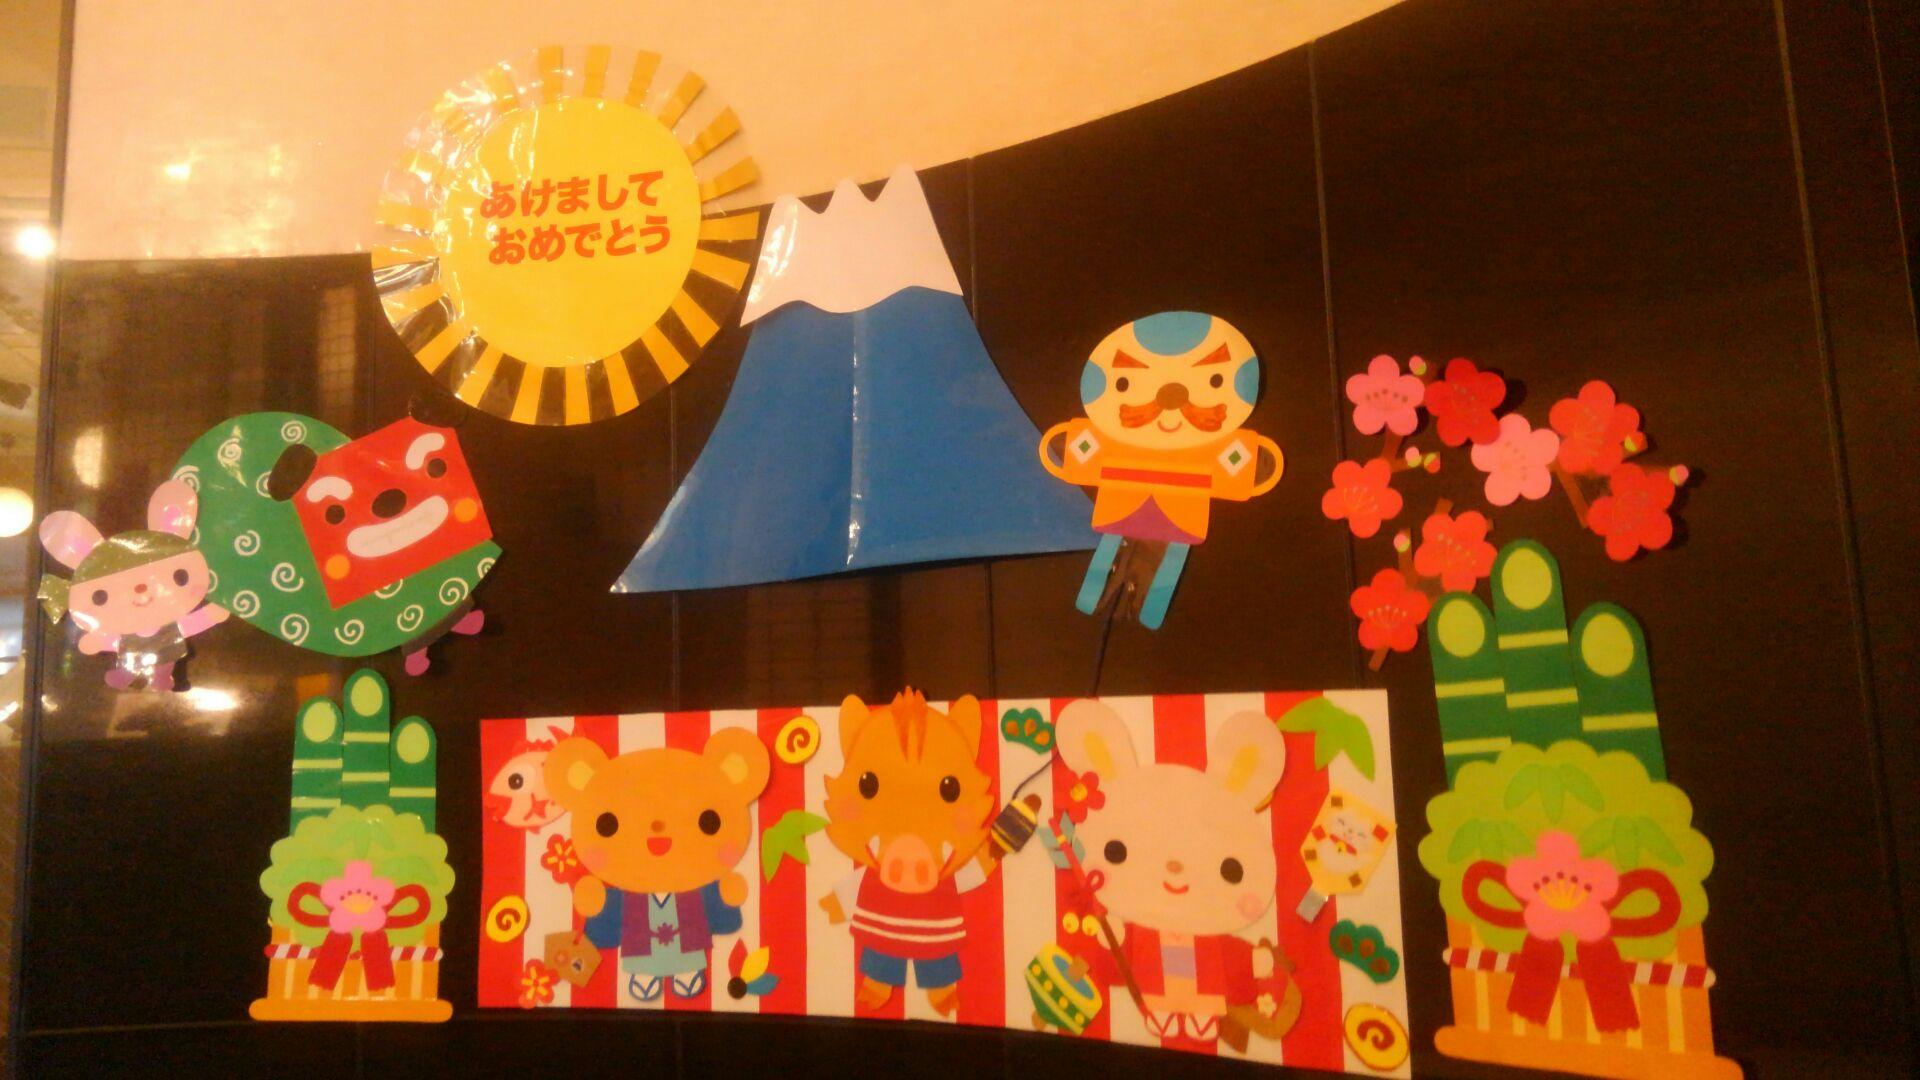 KMAリトミック教室に参加するため国立音楽院に来校された皆様を富士山・初日の出・凧・門松など可愛いイラストがお出迎え